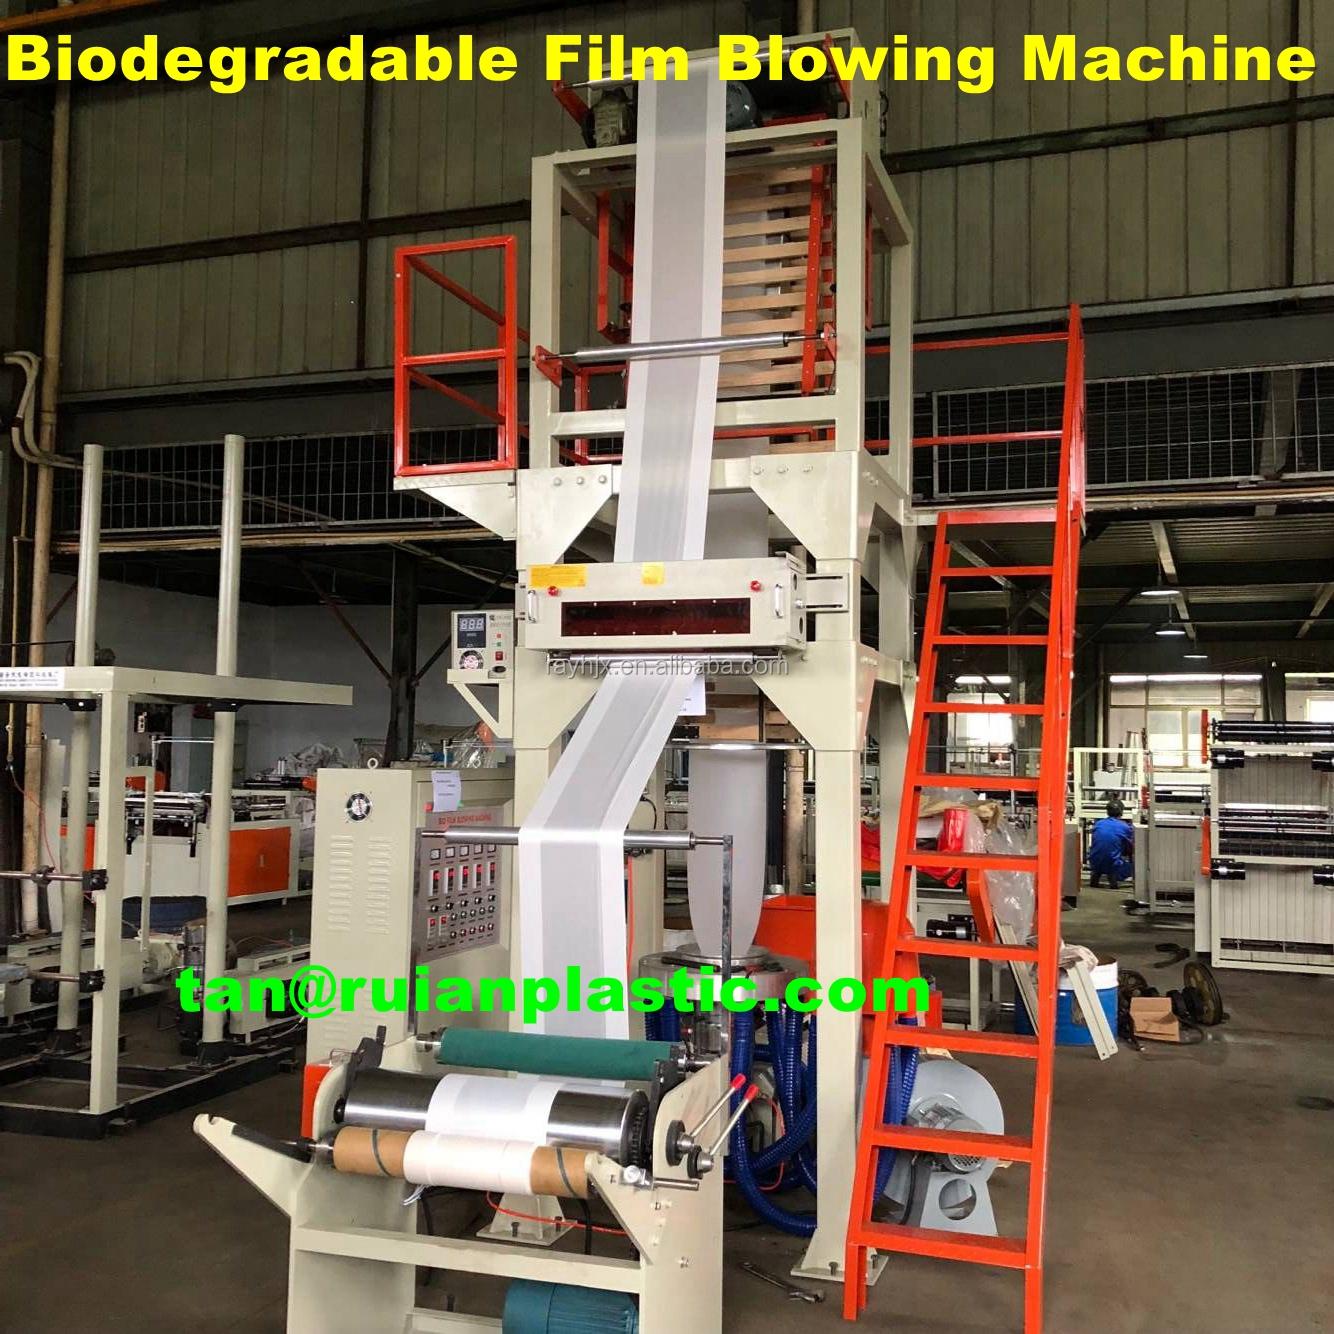 Biodegradable Film Blowing Machine